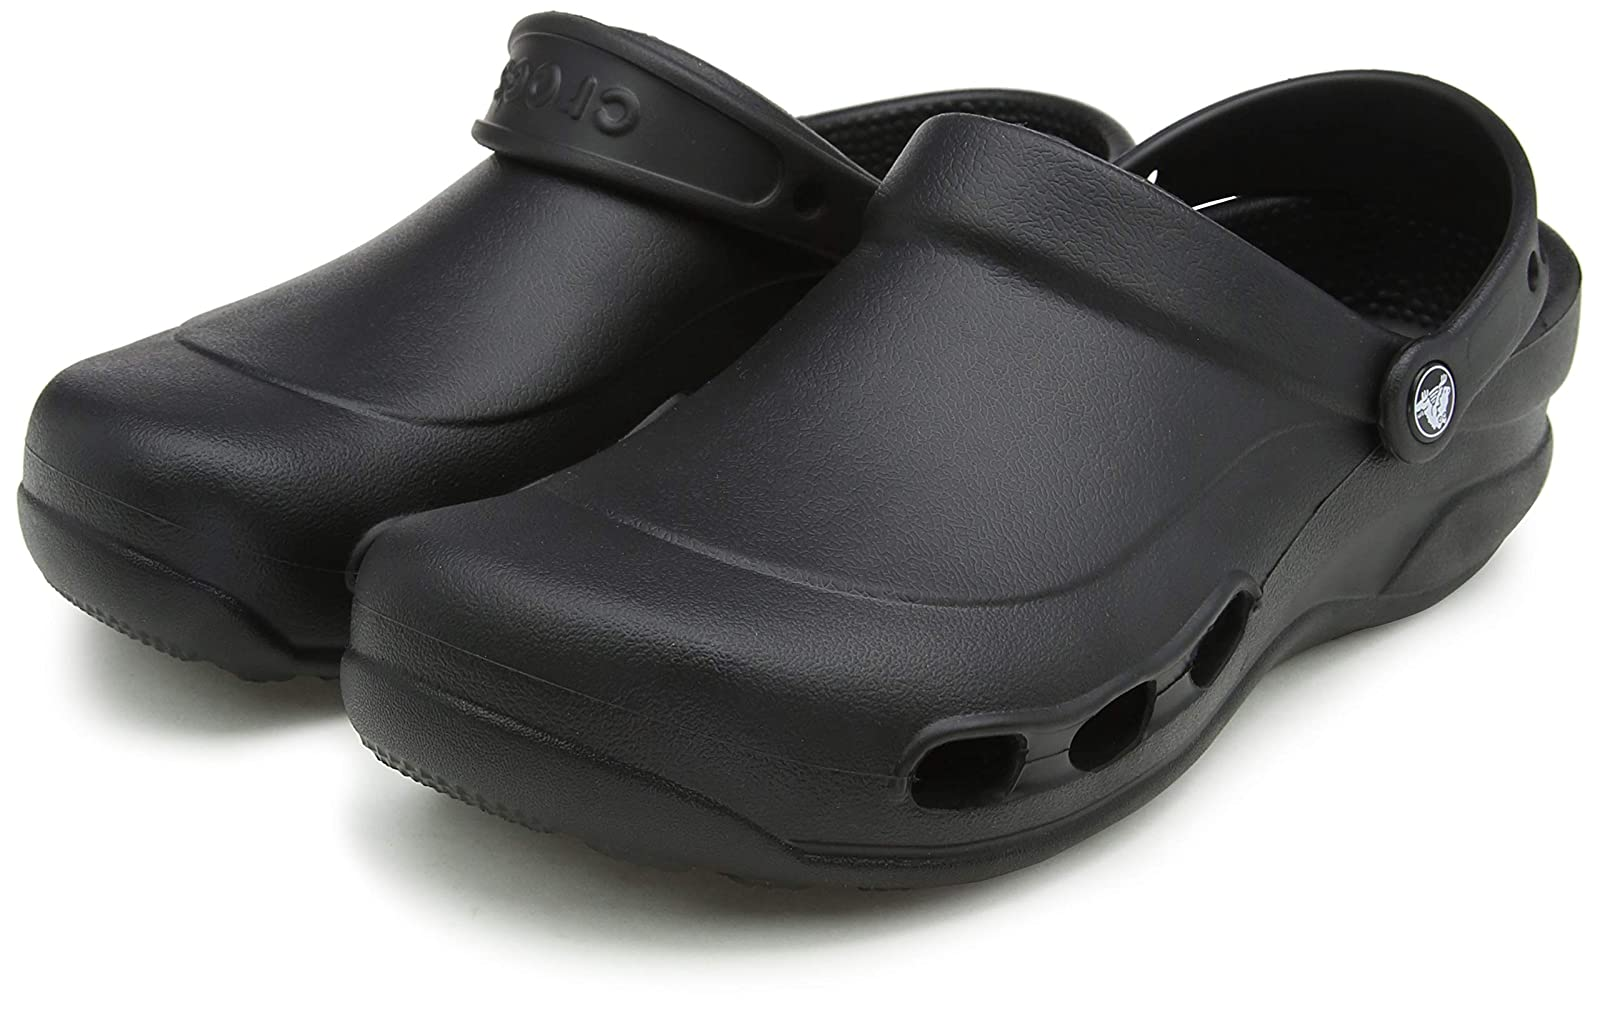 Crocs Unisex Specialist Vent Clog Black 11 10074M Black - 7